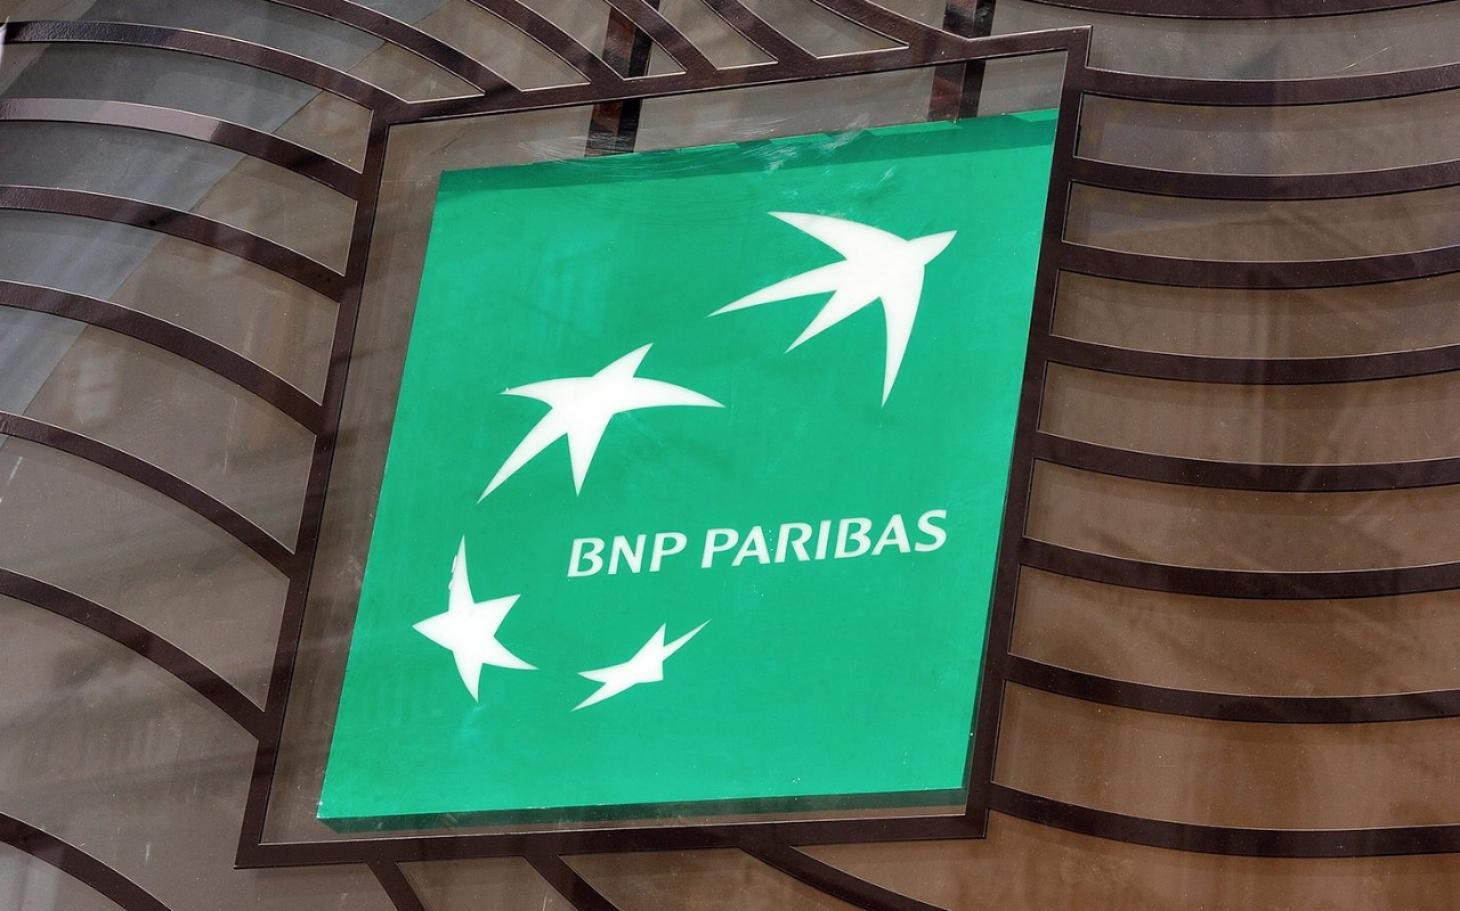 BNP Paribas Named World's Best Bank